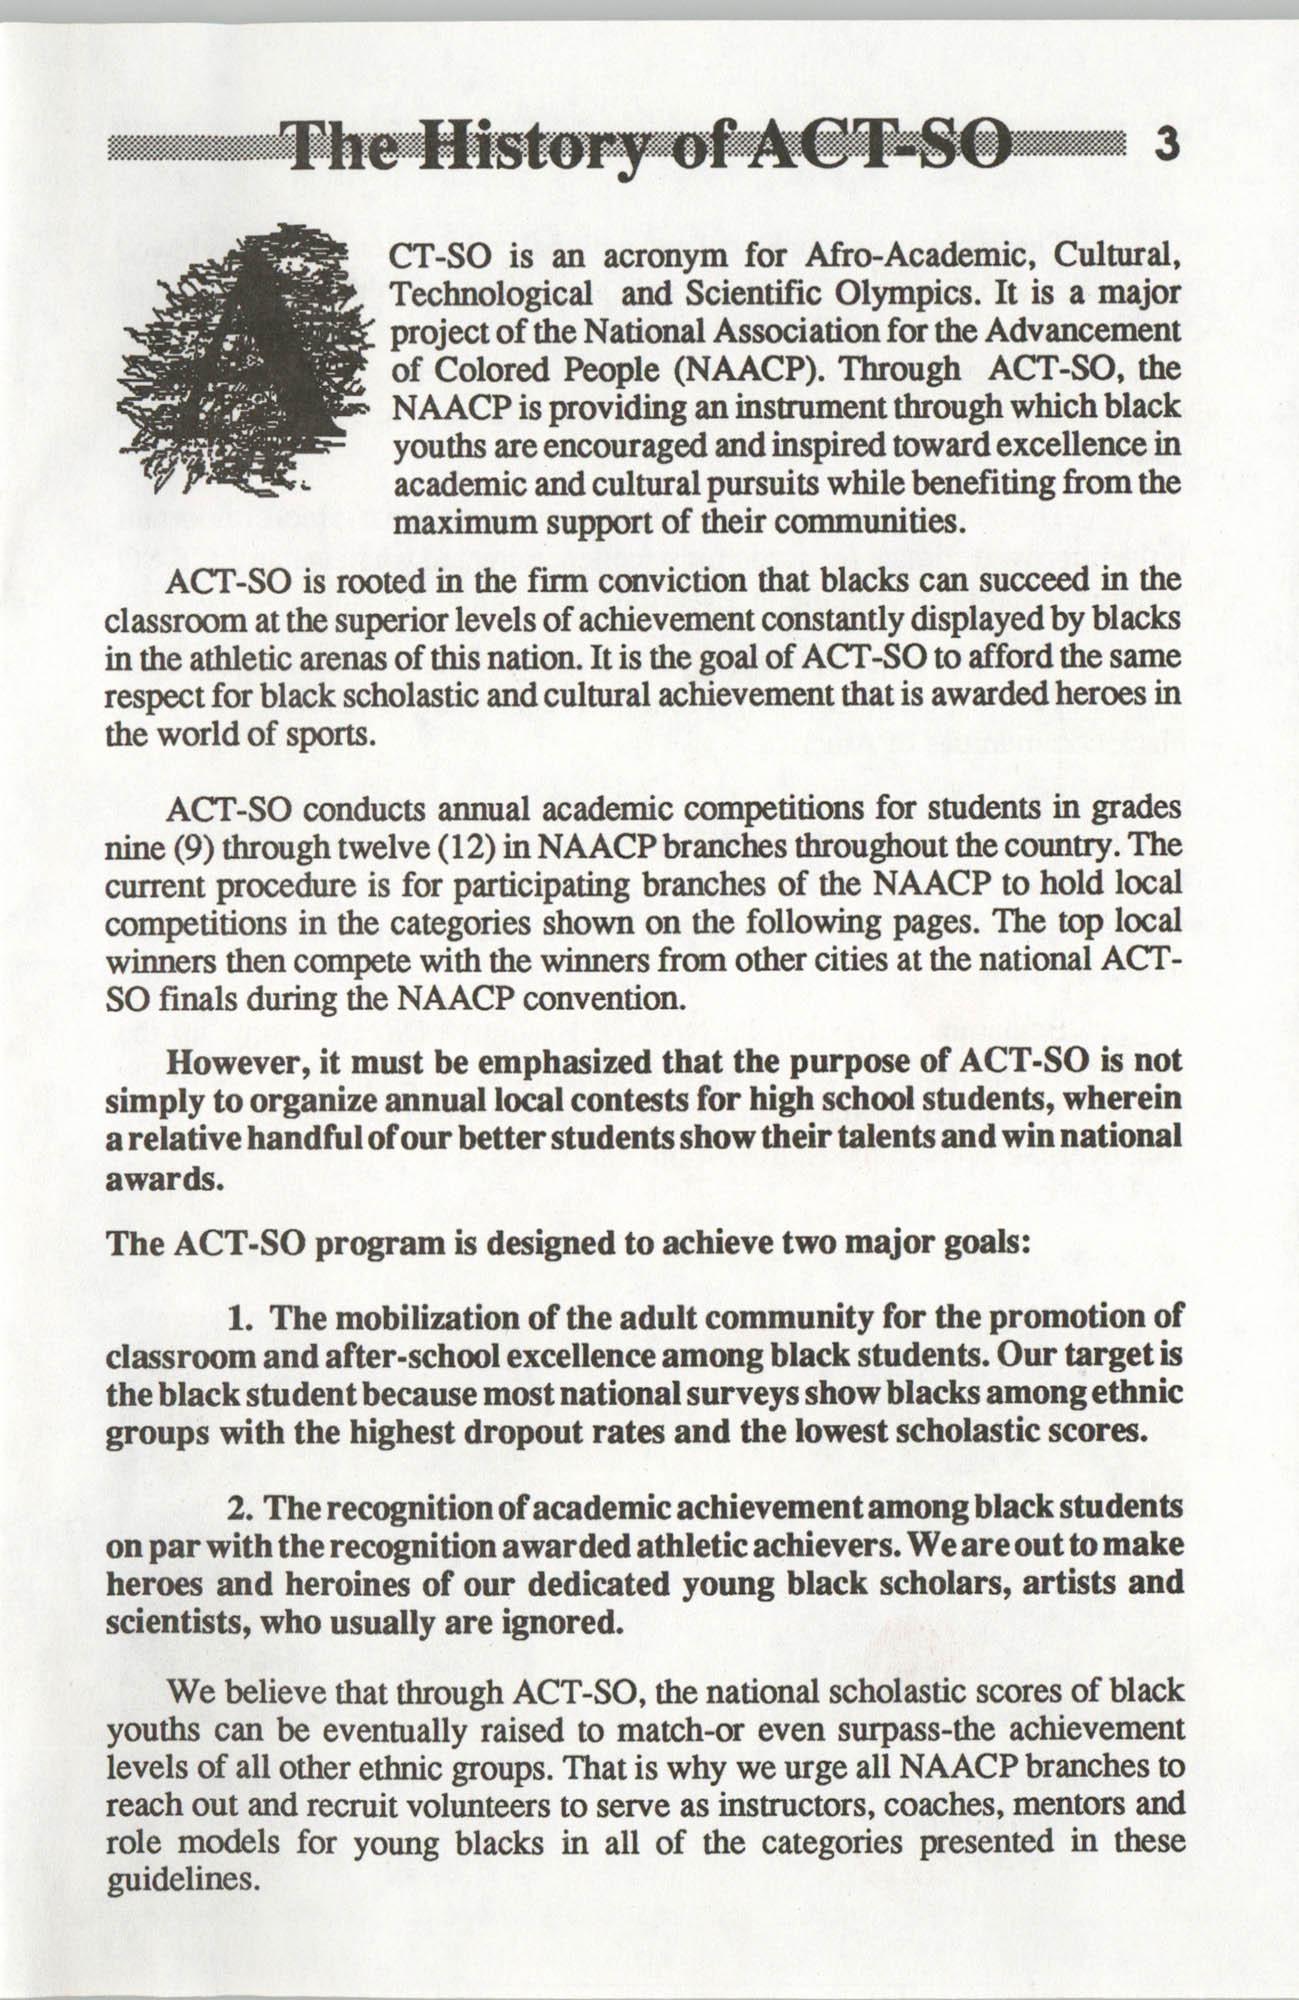 Brochure, ACT-SO Program, NAACP, 1992, Page 3